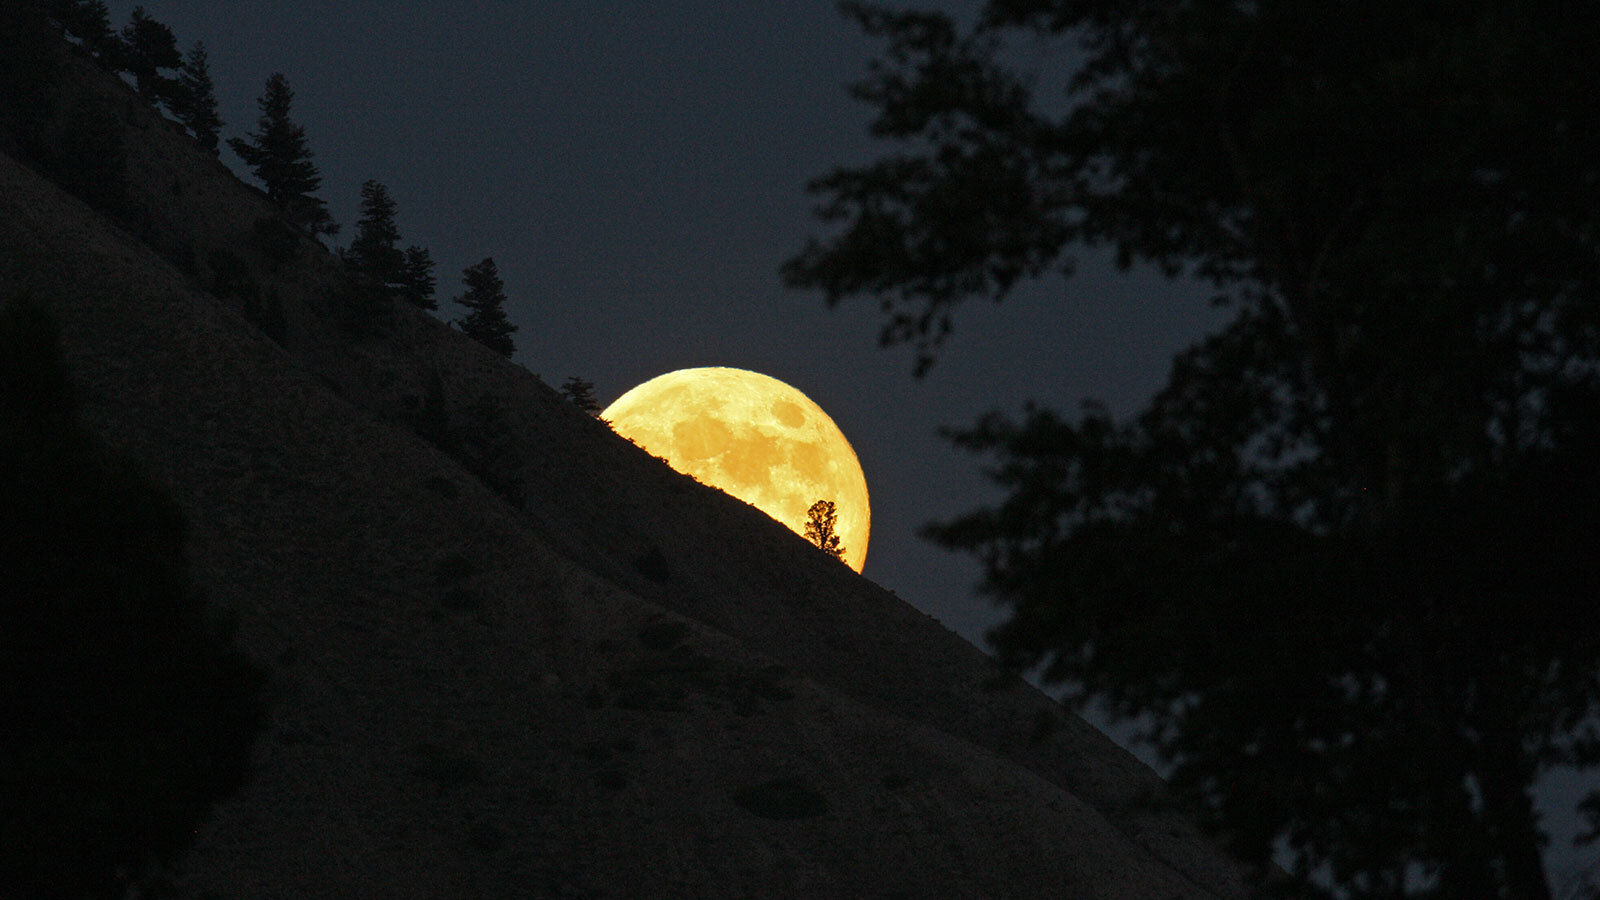 The Next Full Moon is Another Wolf Moon – NASA Solar System Exploration - NASA Planetary Science